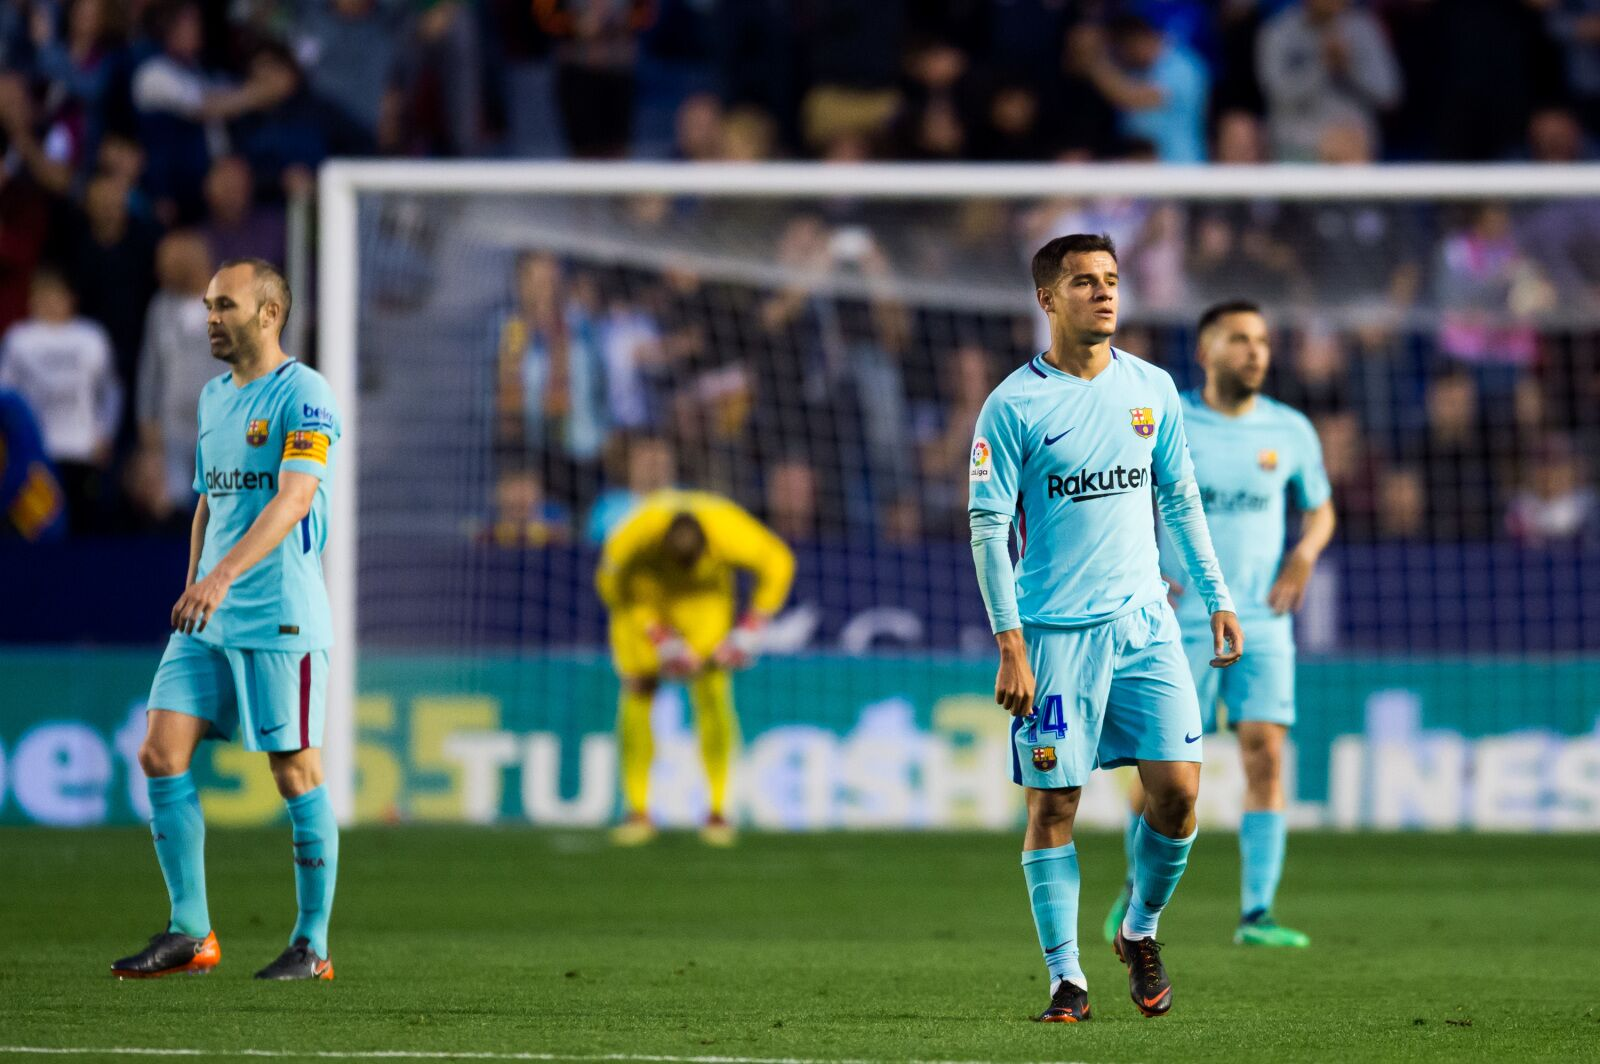 Barcelona travel to Levante in La Liga matchday 16